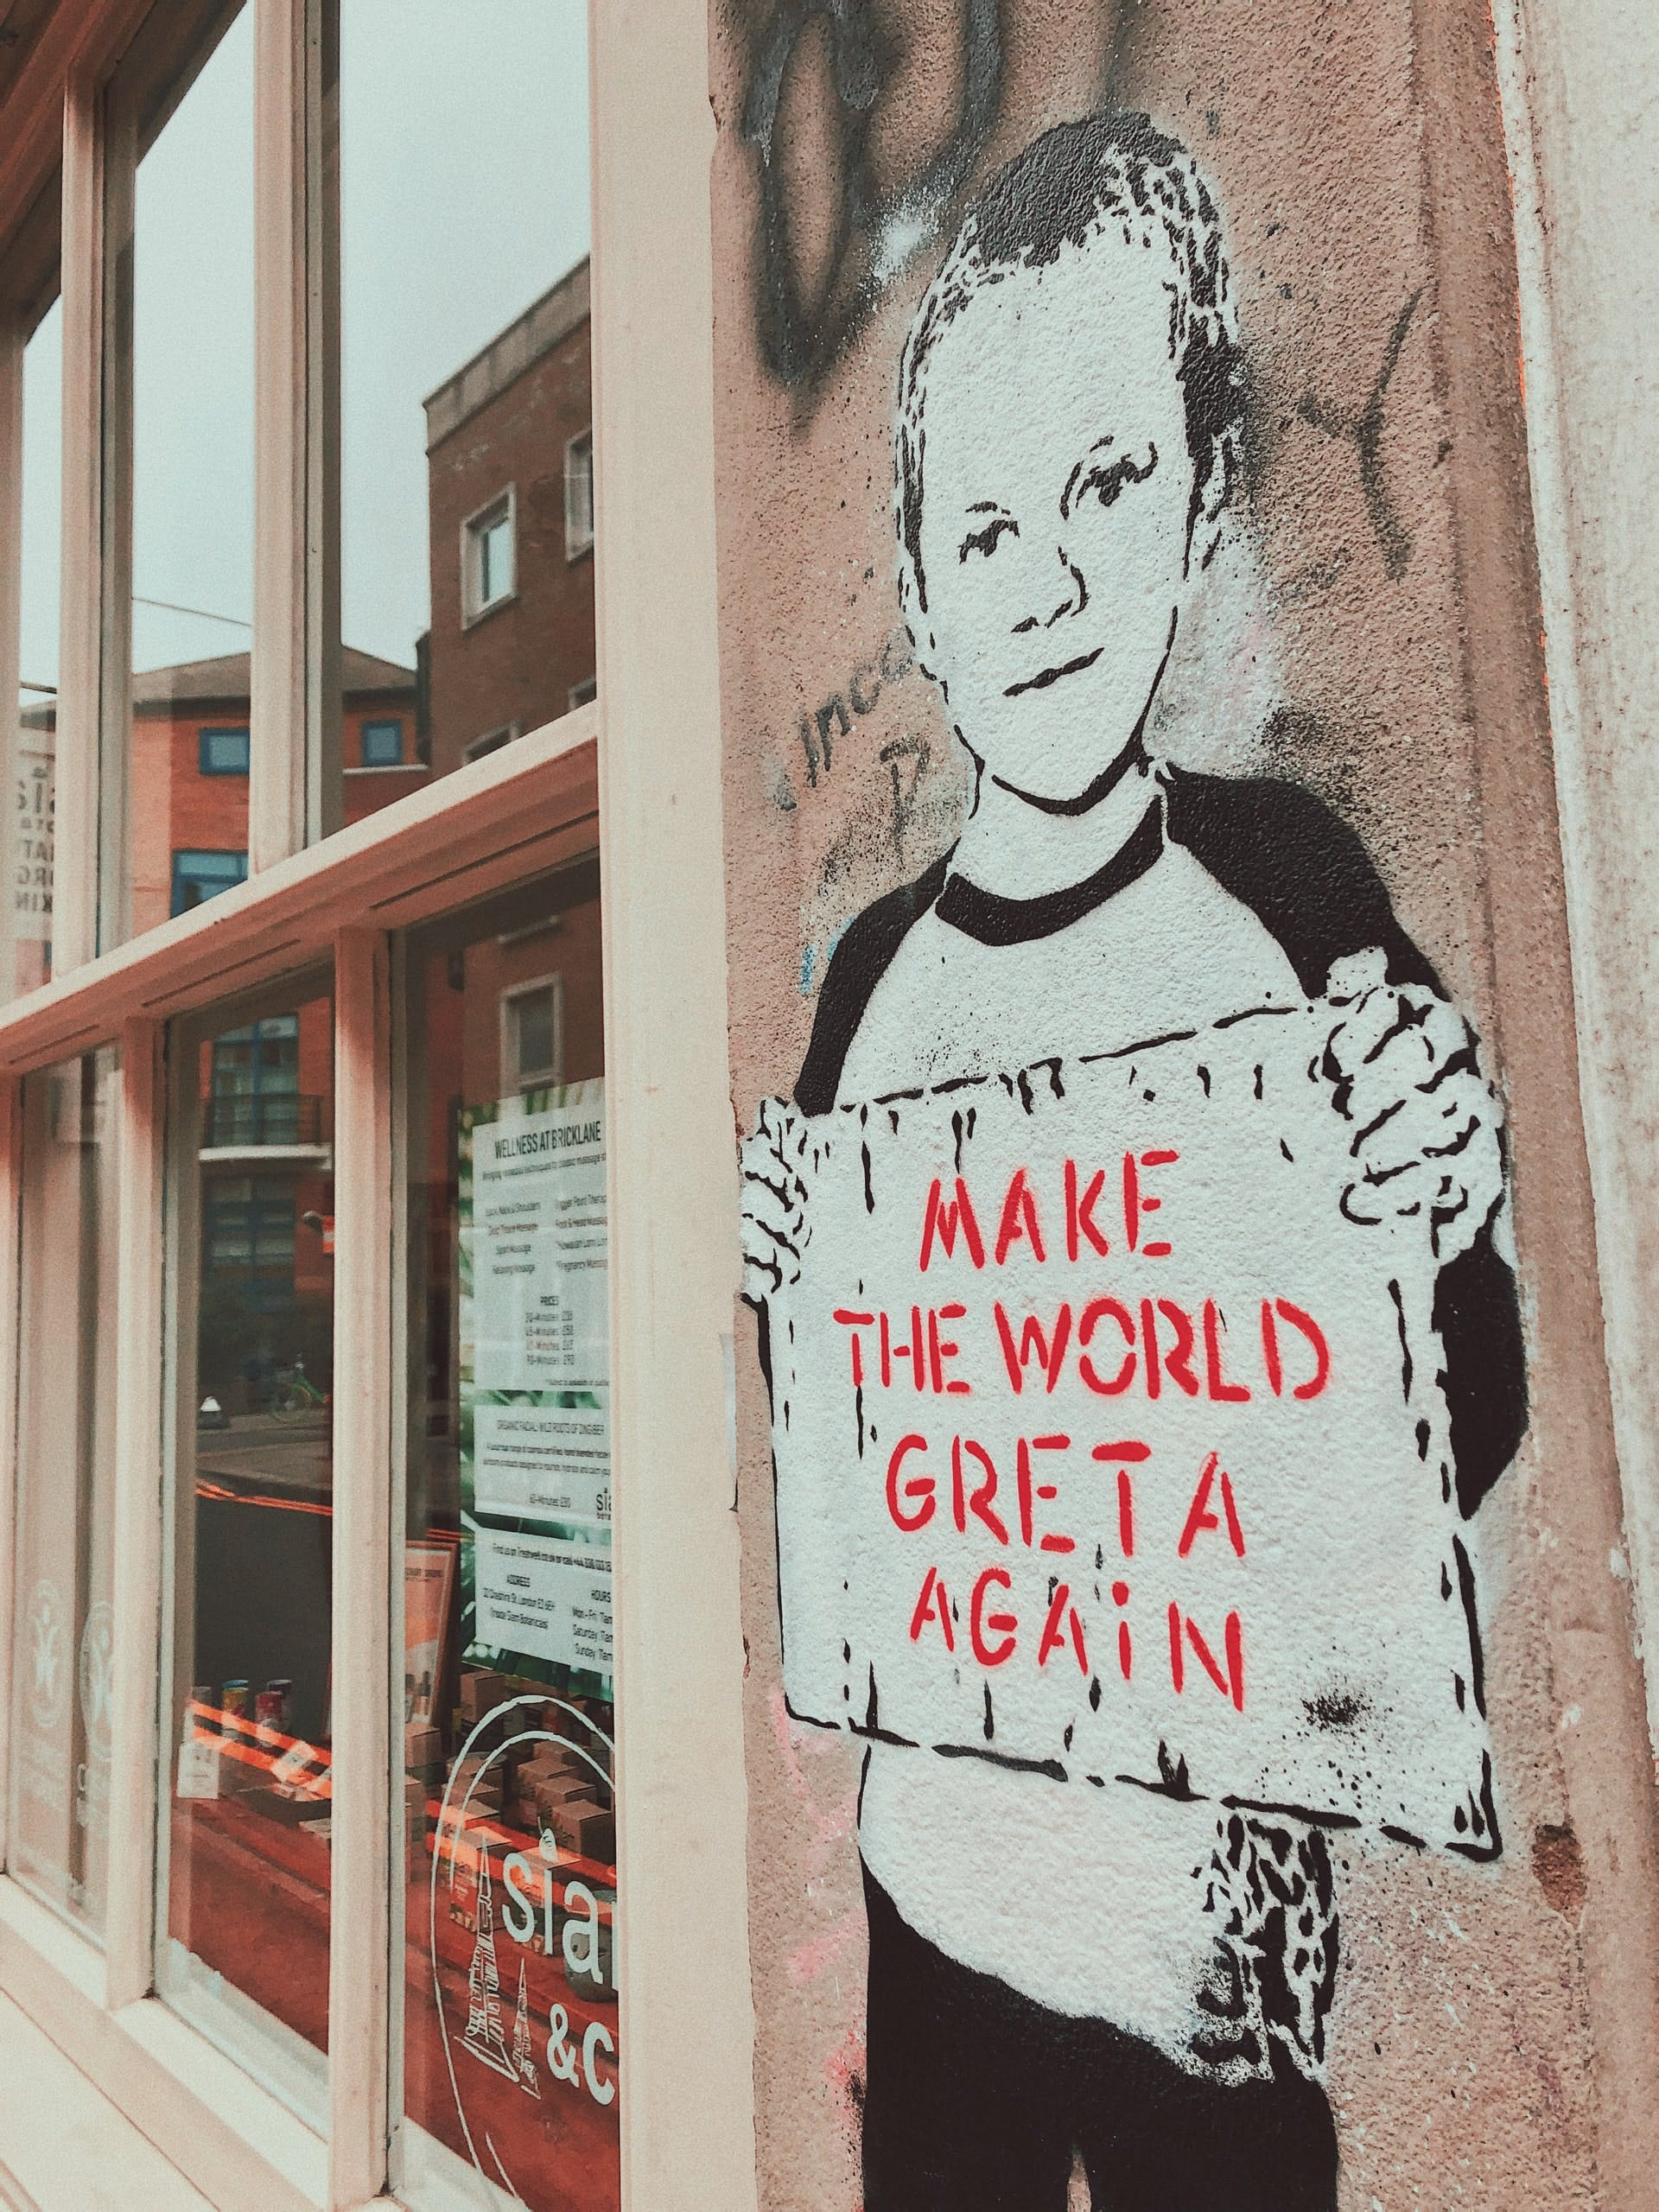 Street art of Greta Thunberg